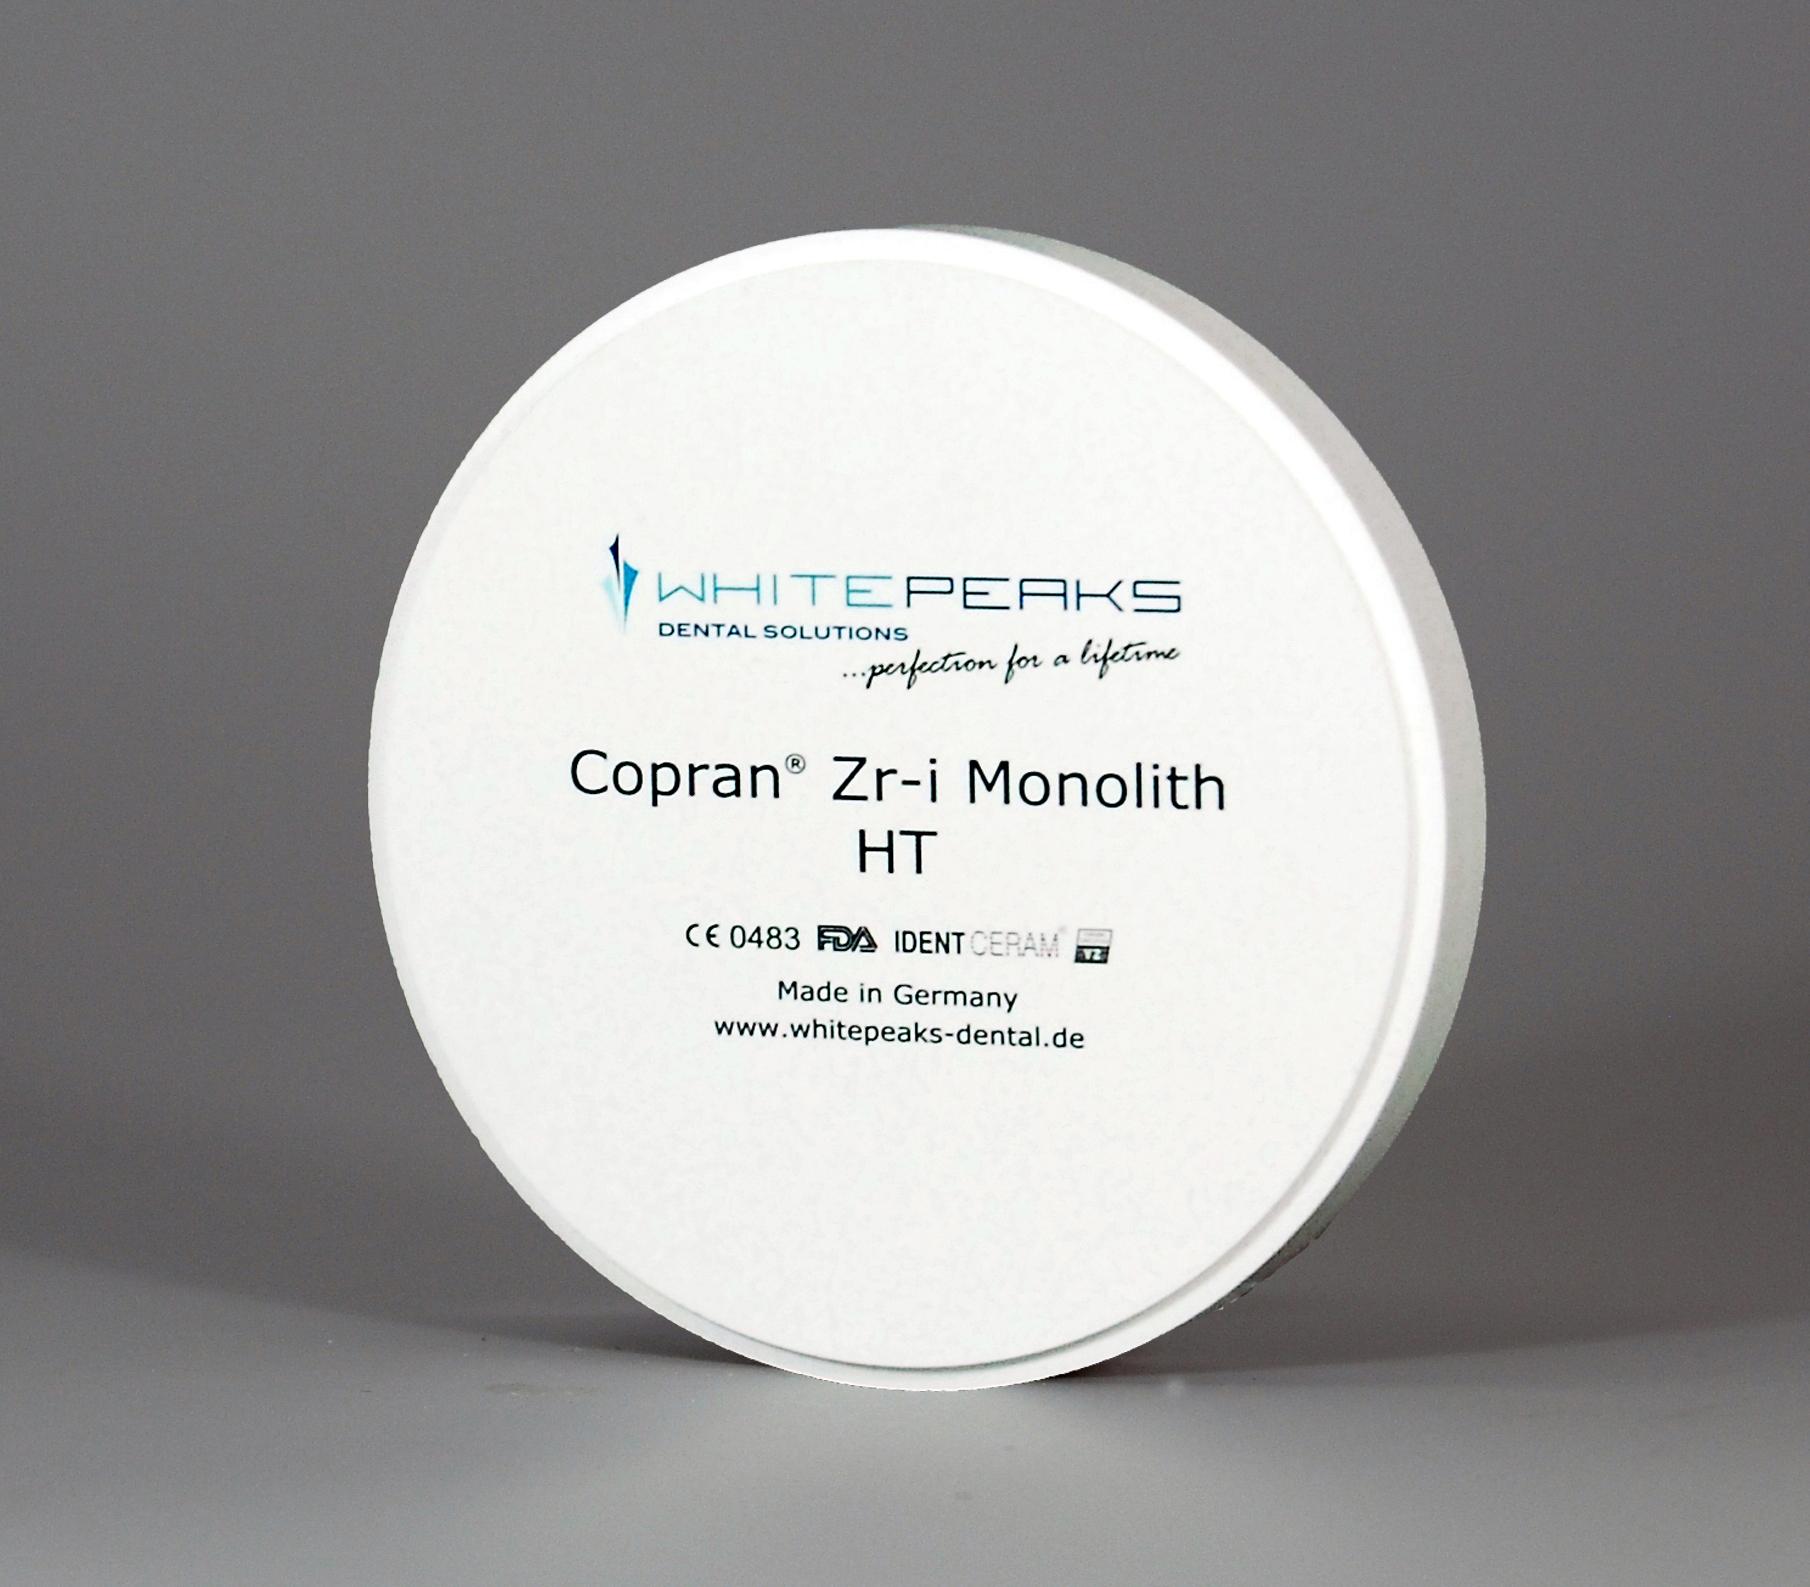 Copran Zr-i Monolith System 95